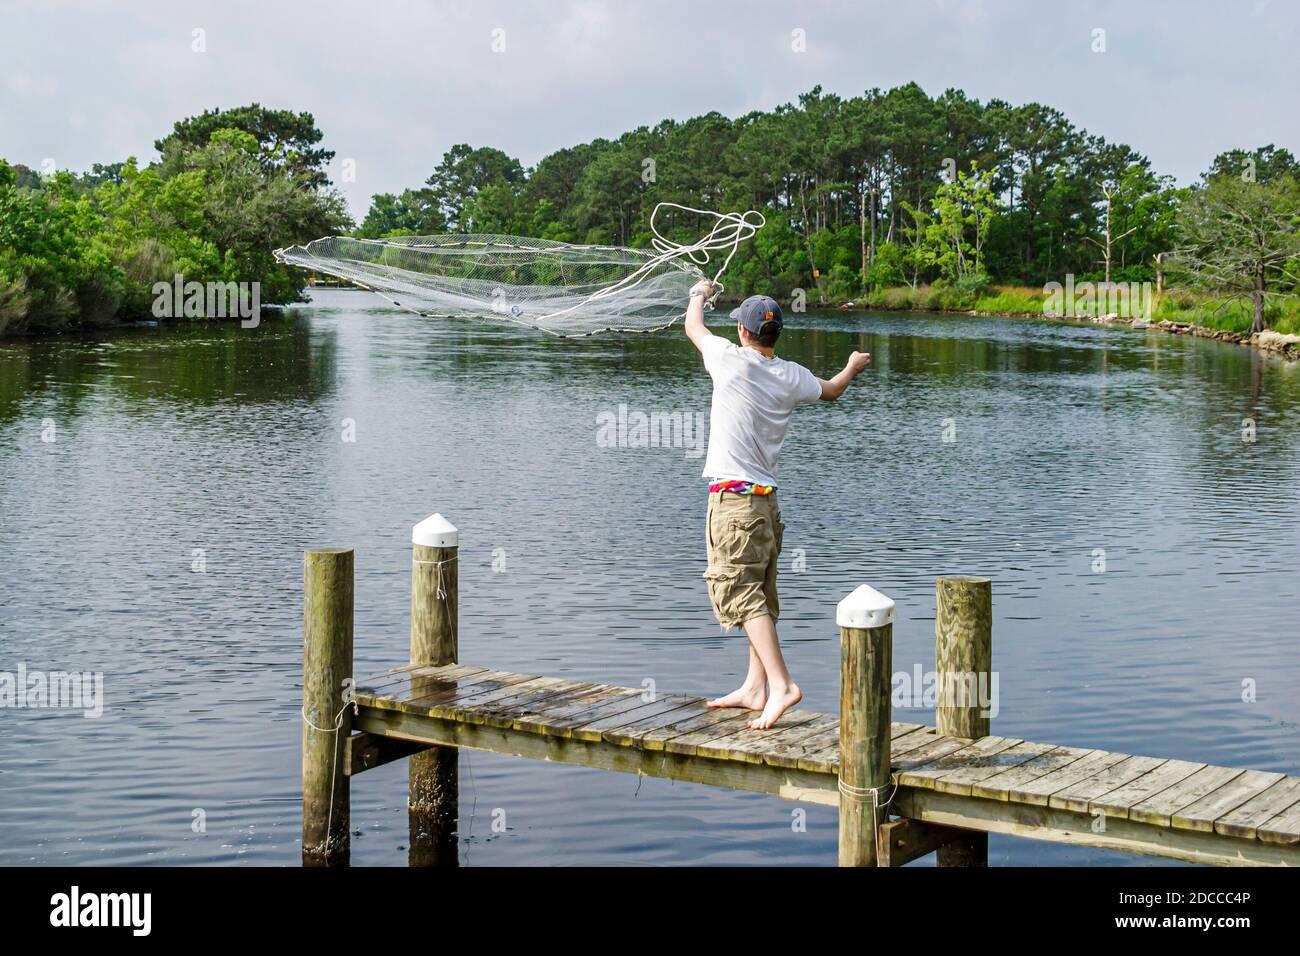 Louisiana St. Tammany Parish Slidell, Liberty Bayou, crabbing fishing man pier tossing net, Stock Photo